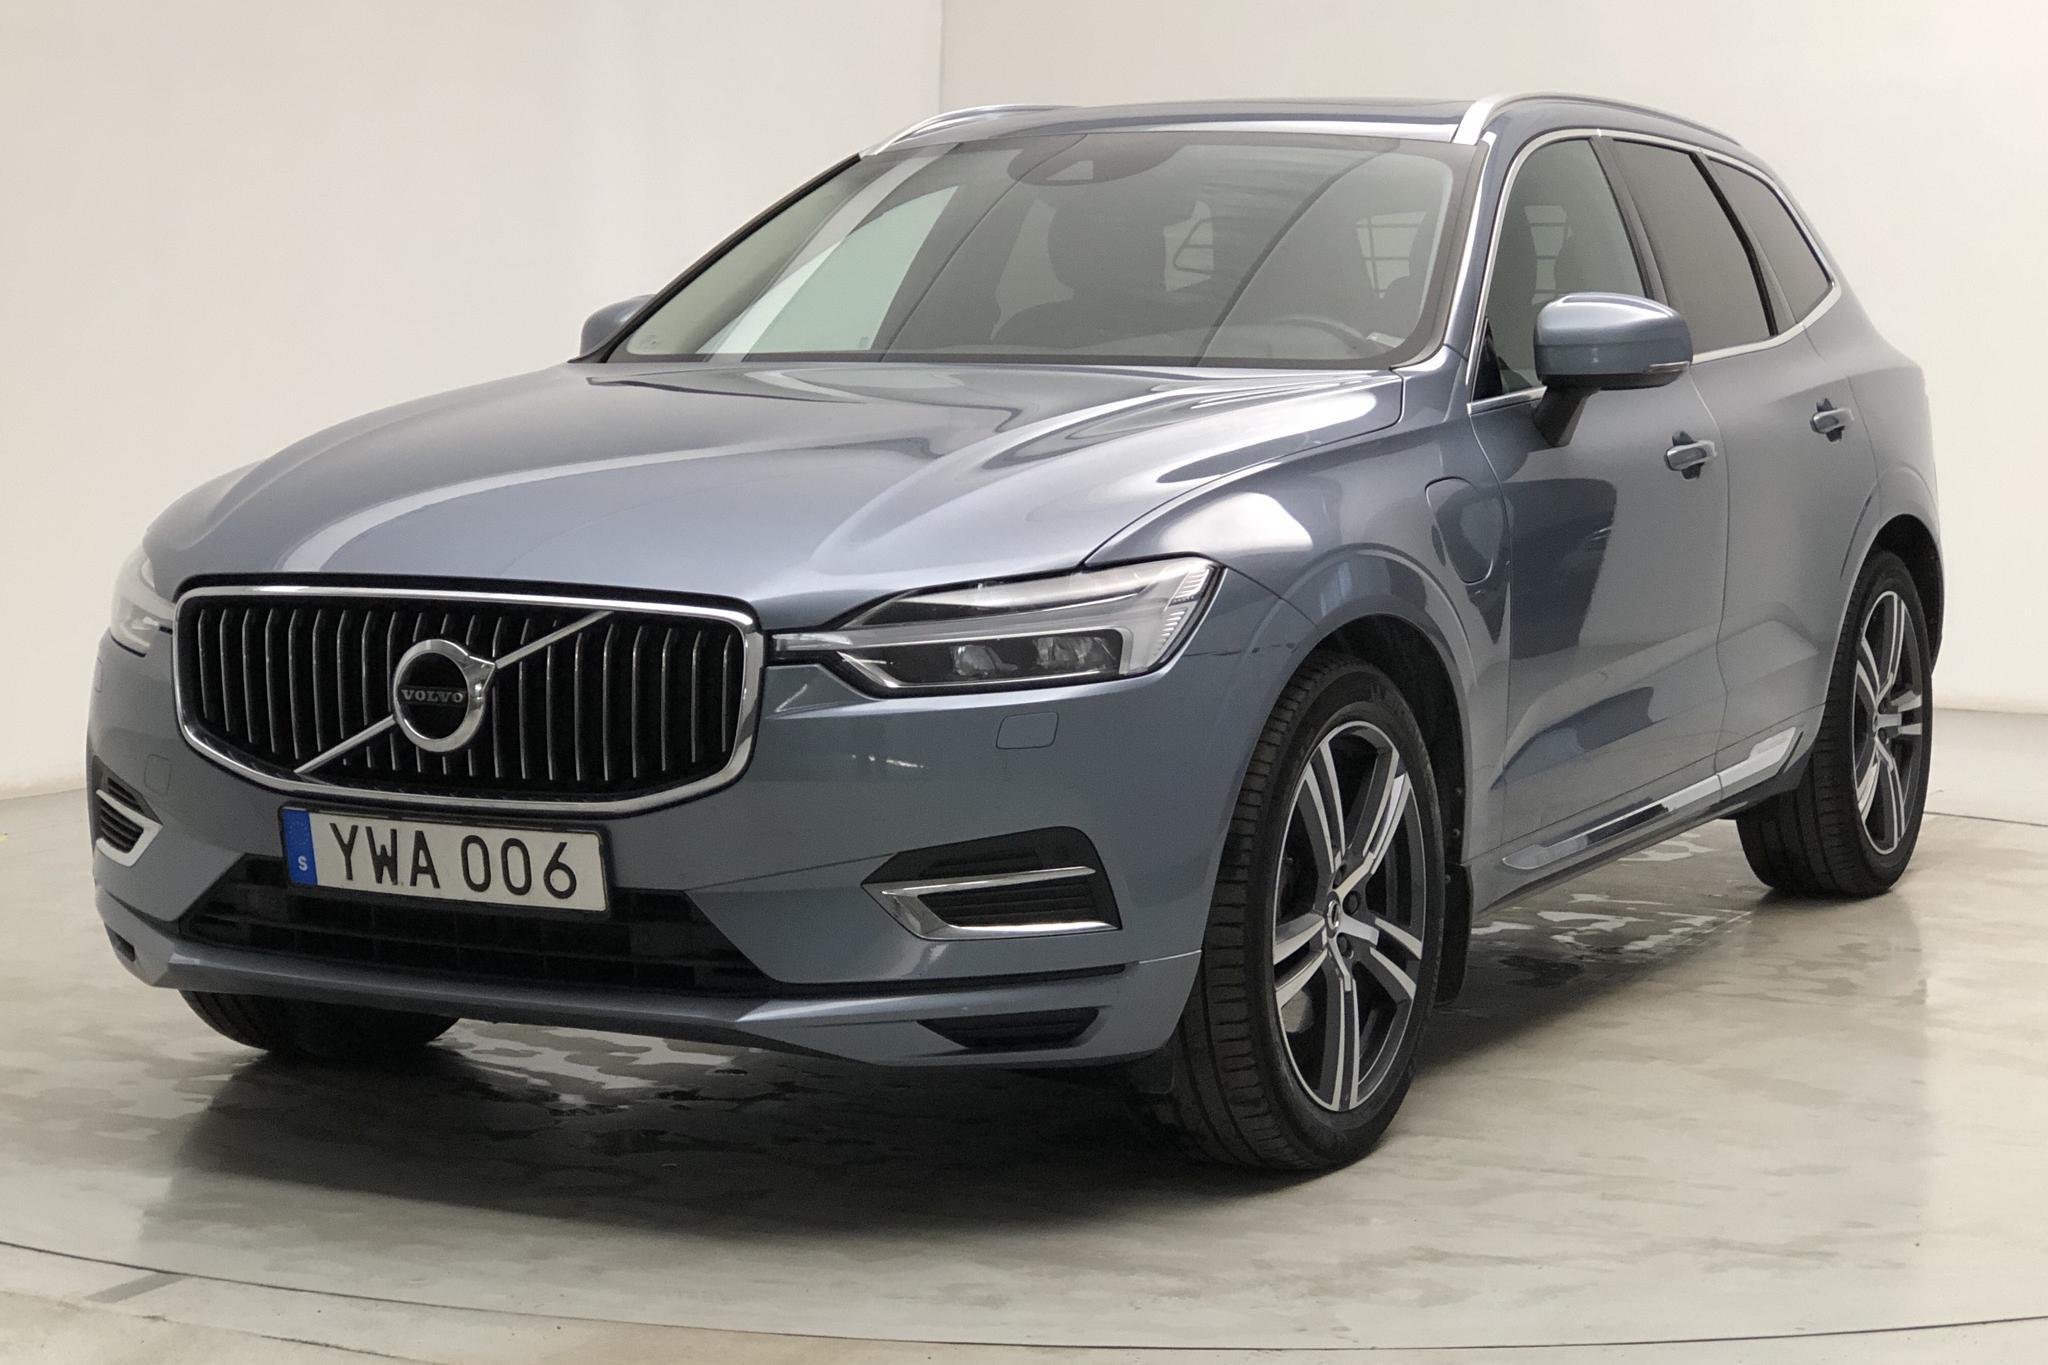 Volvo XC60 T8 AWD Twin Engine (407hk) - 8 332 mil - Automat - Light Blue - 2018